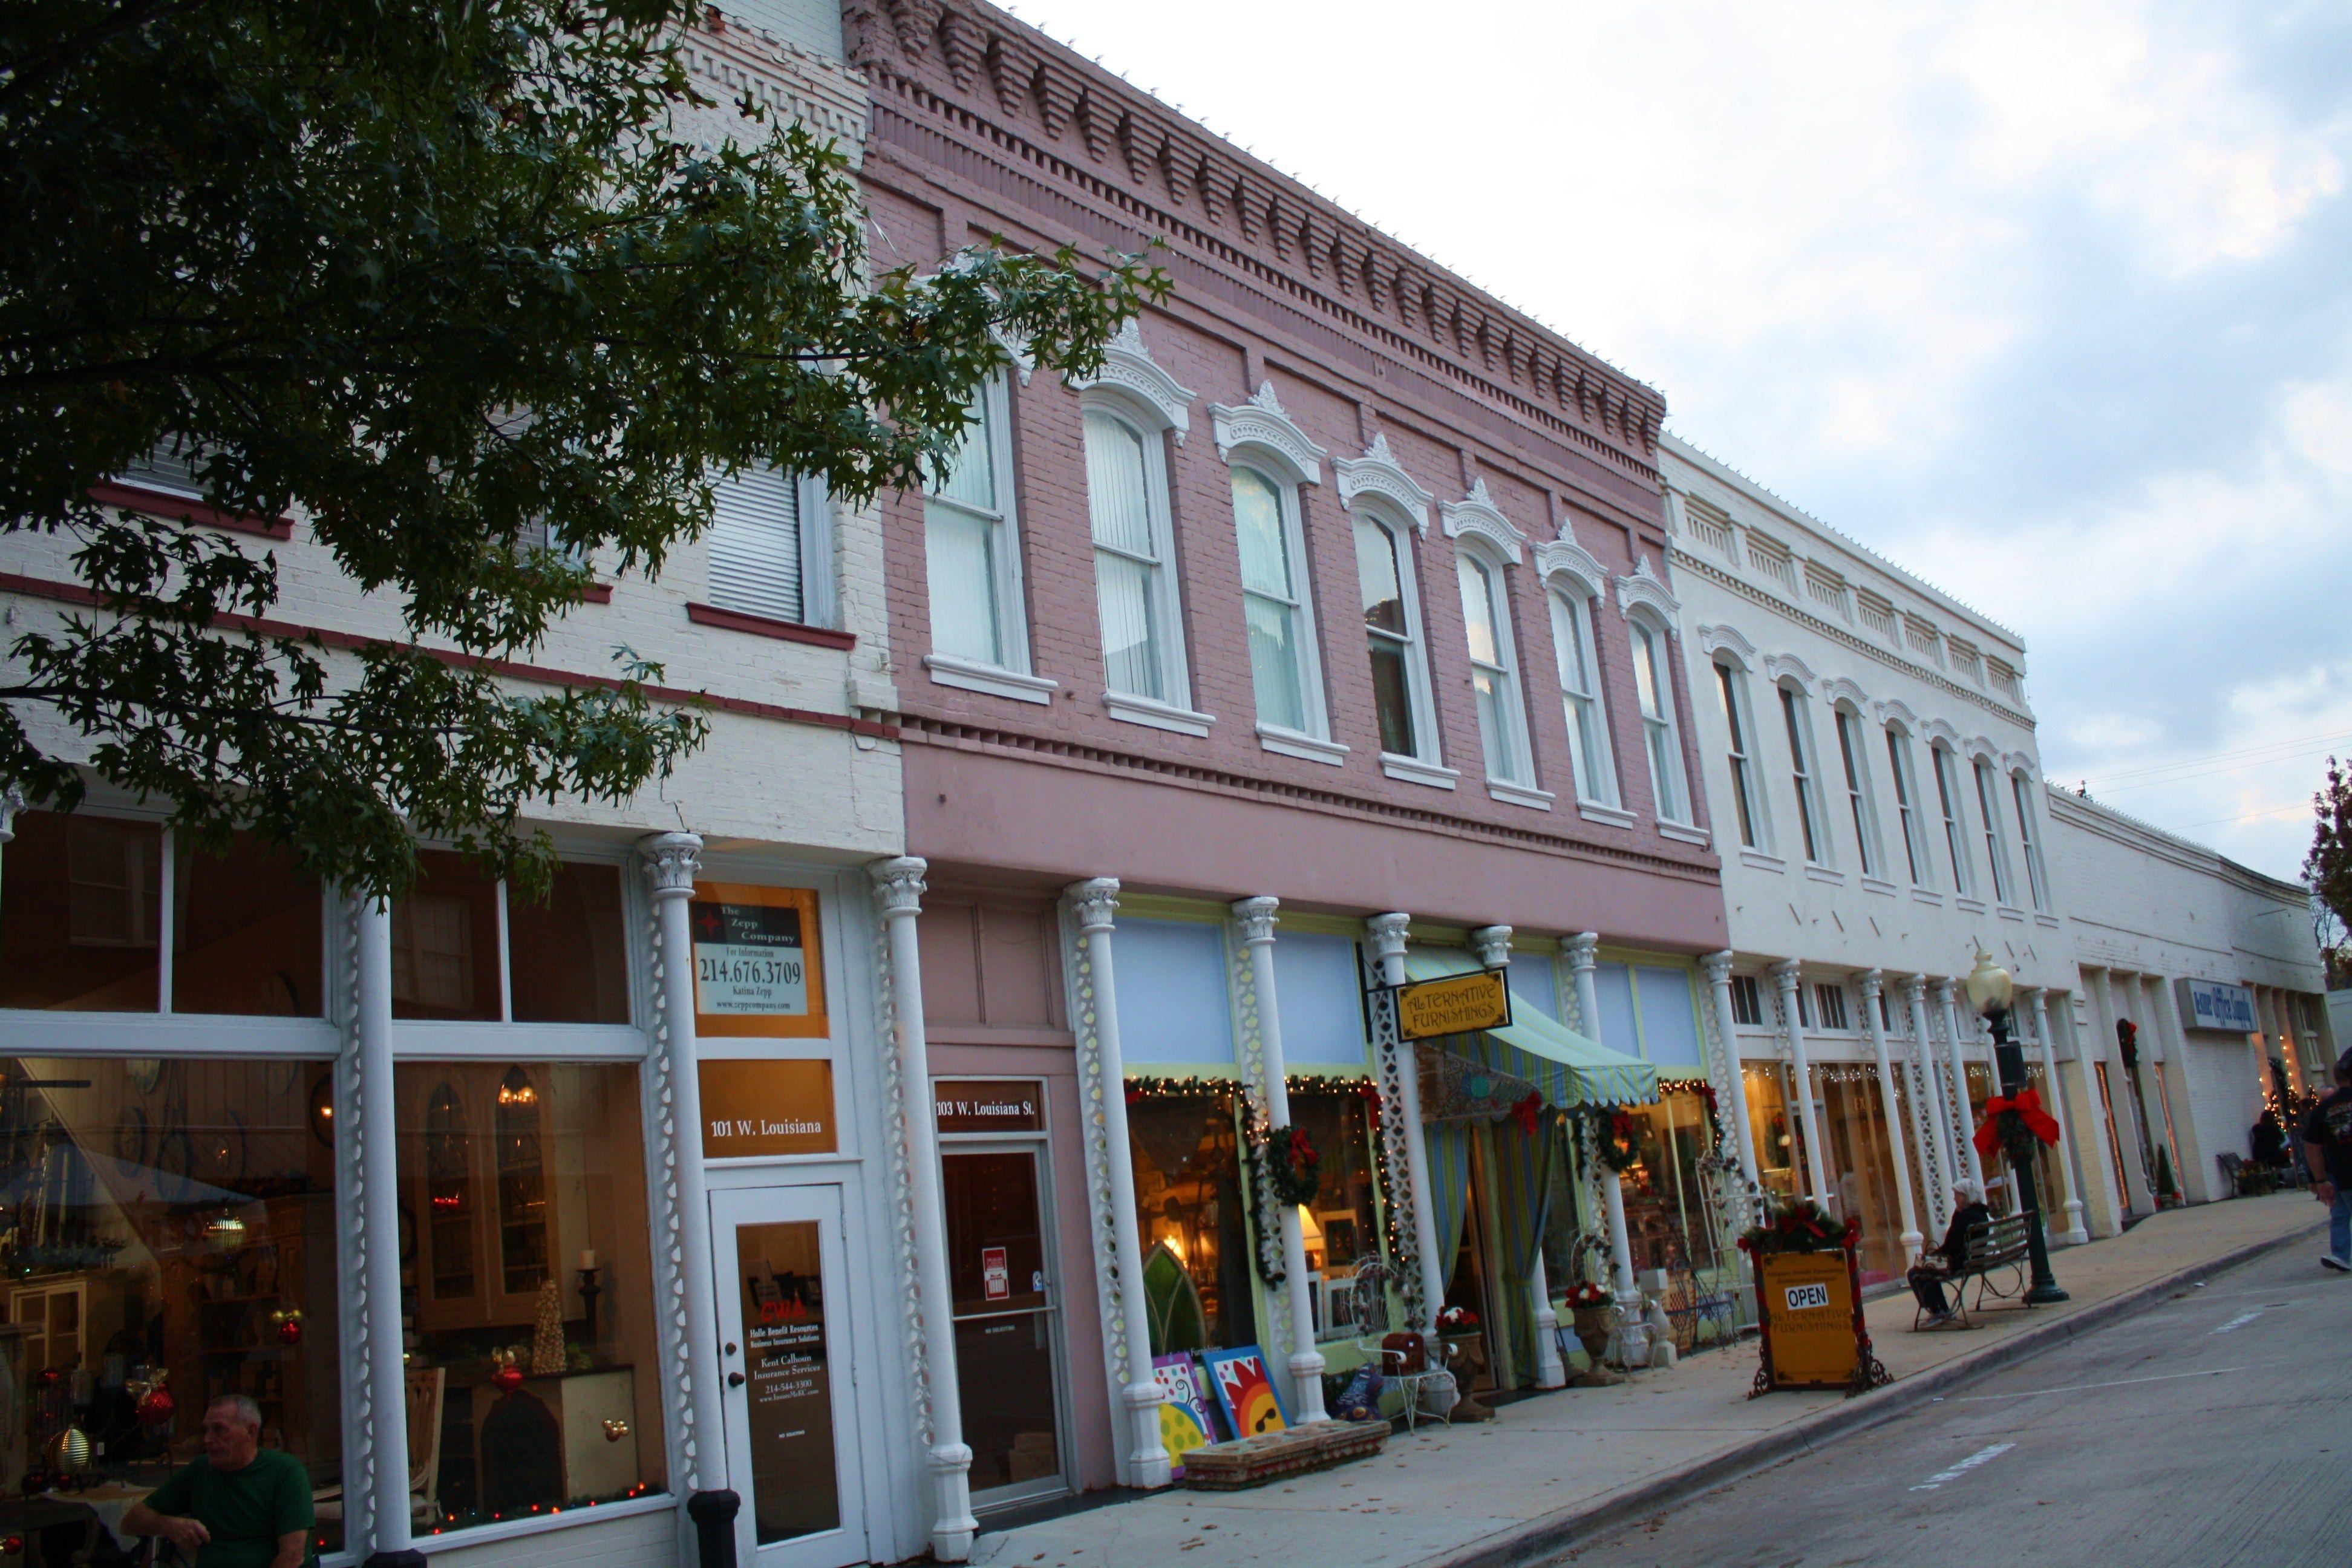 Downtown Mckinney Texas Adventure Shopping Texas Travel Vacation Trips